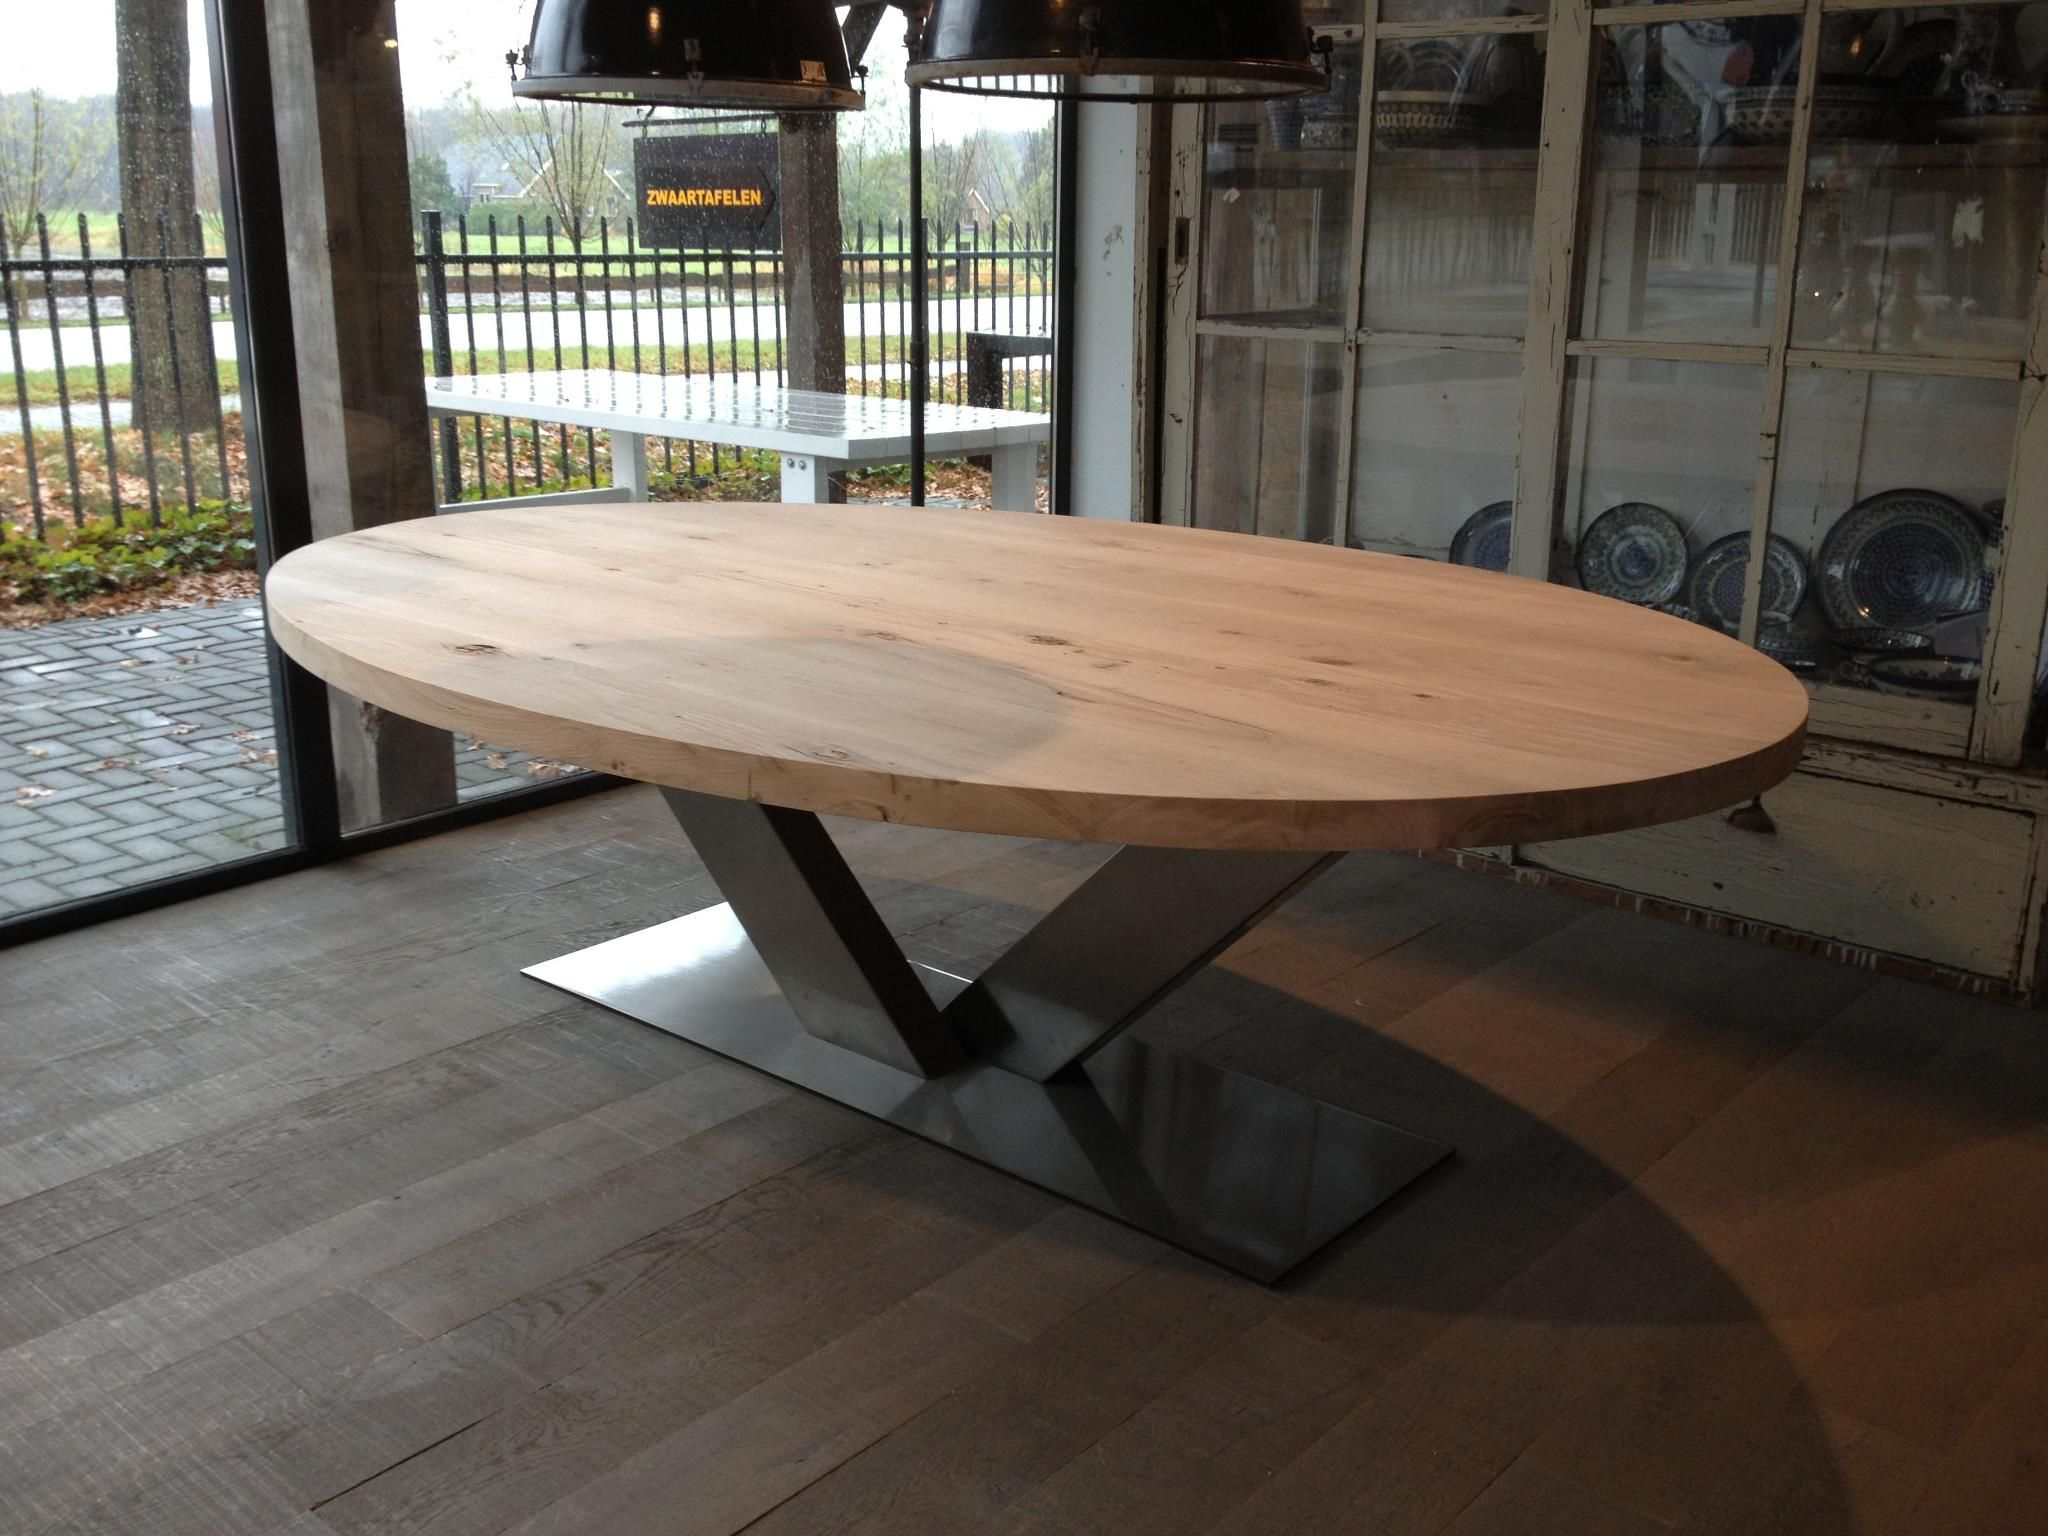 10x Ronde Salontafel : Zwaartafelen i ovale tafel www.zwaartafelen.nl meubels Κουζίνα